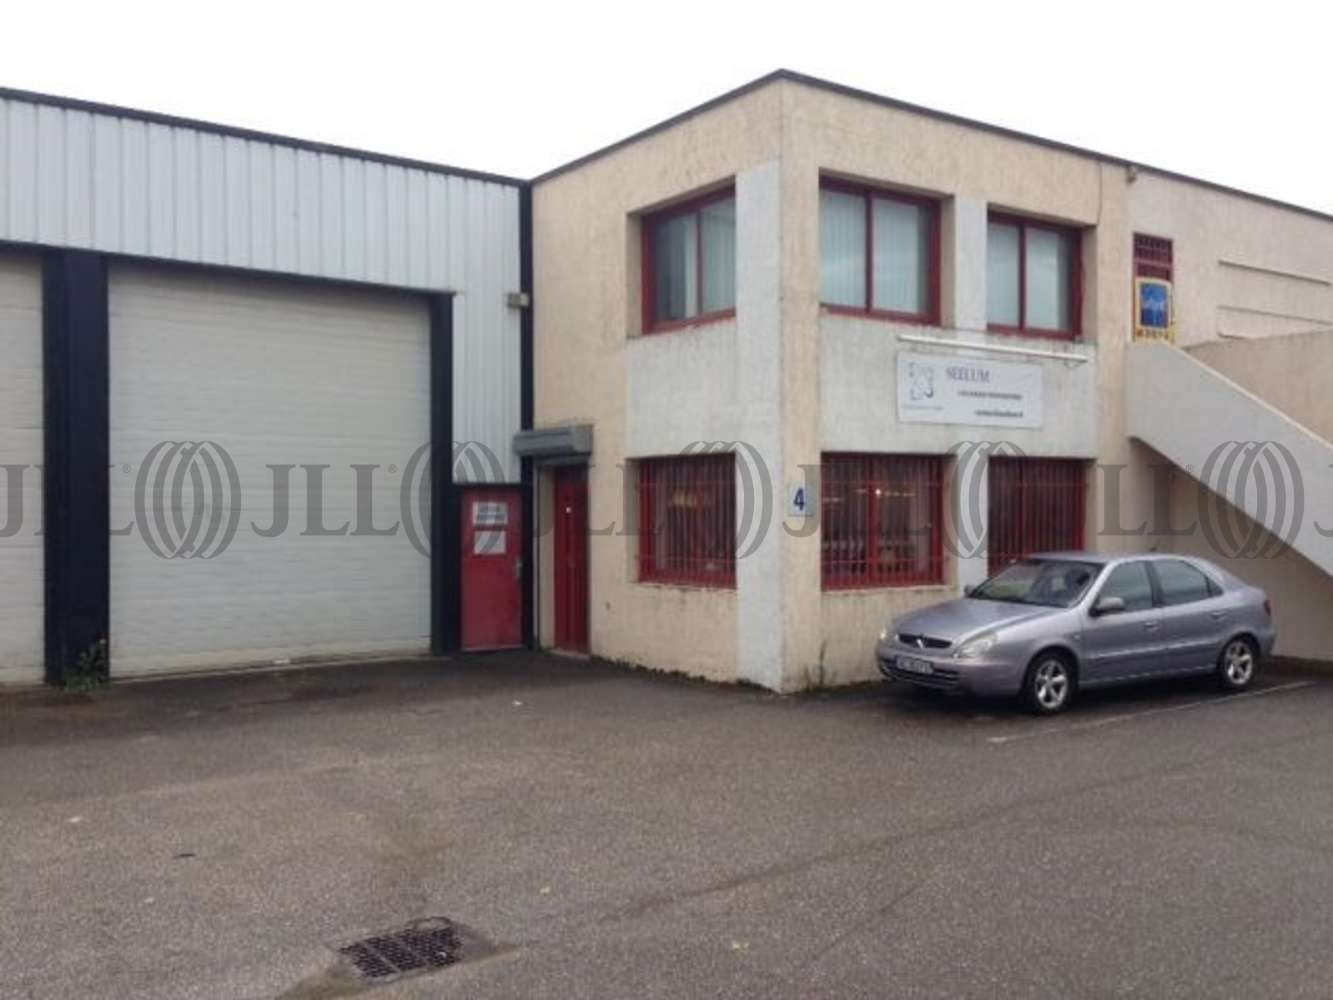 Activités/entrepôt Chassieu, 69680 - Location entrepot Chassieu (69) - 10011016